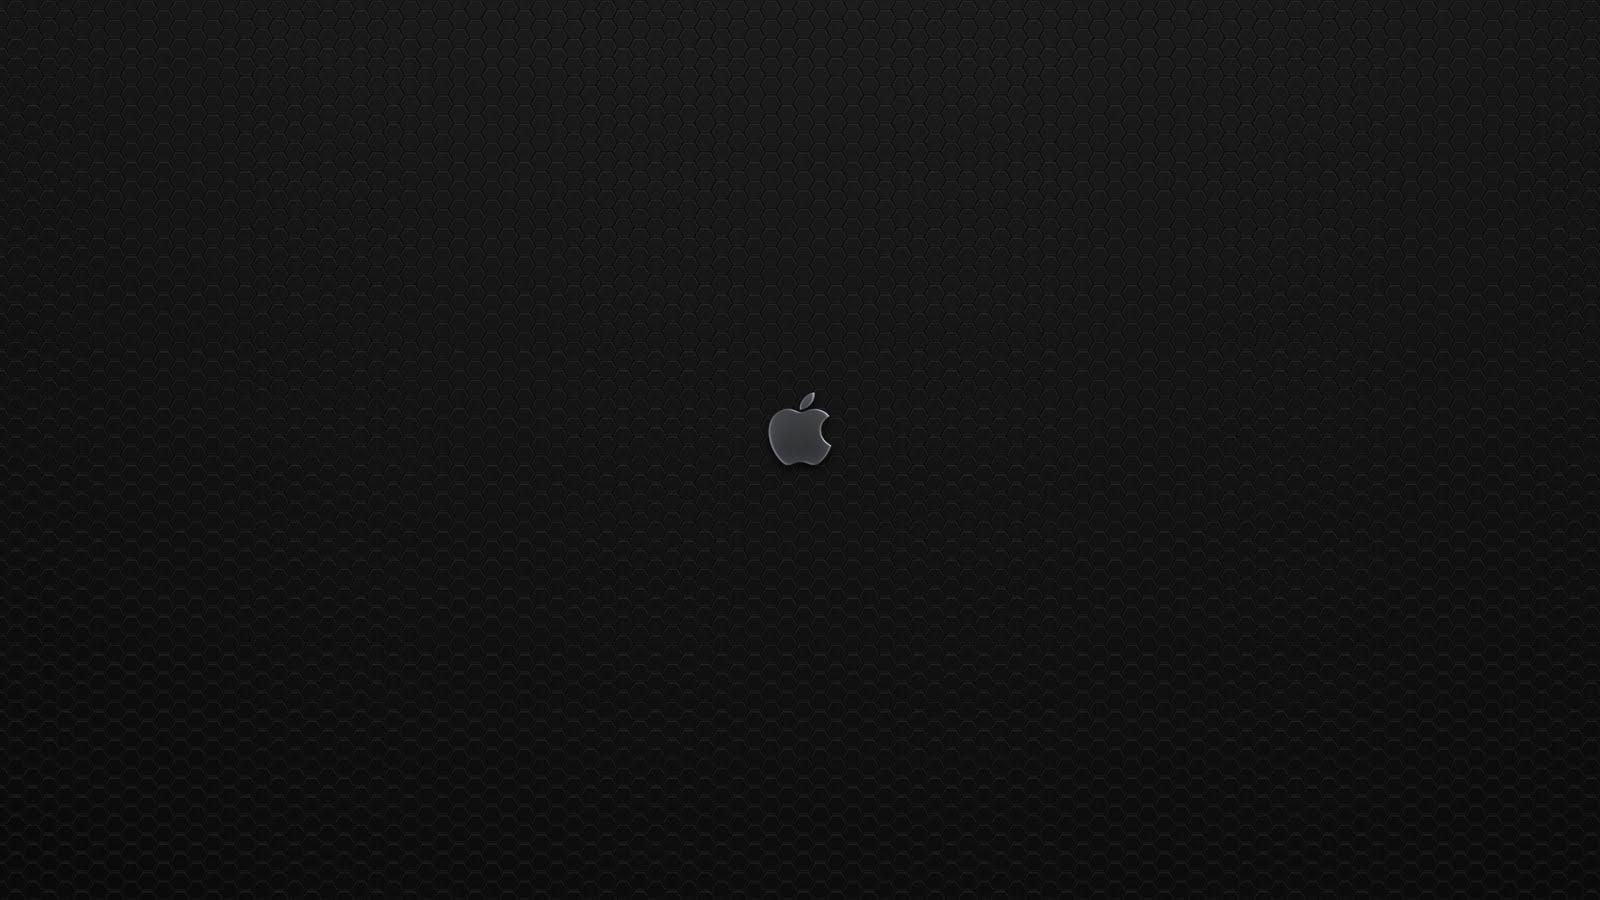 http://3.bp.blogspot.com/_mC1TEdZ4gks/TLhggkbGjZI/AAAAAAAAOJc/WEtBDkoFTE8/s1600/Apple%2BMan%2BPc%2BWallpapers%2B04%2B-%2Bwww.Wallpapersshare.Blogspot.com.jpg